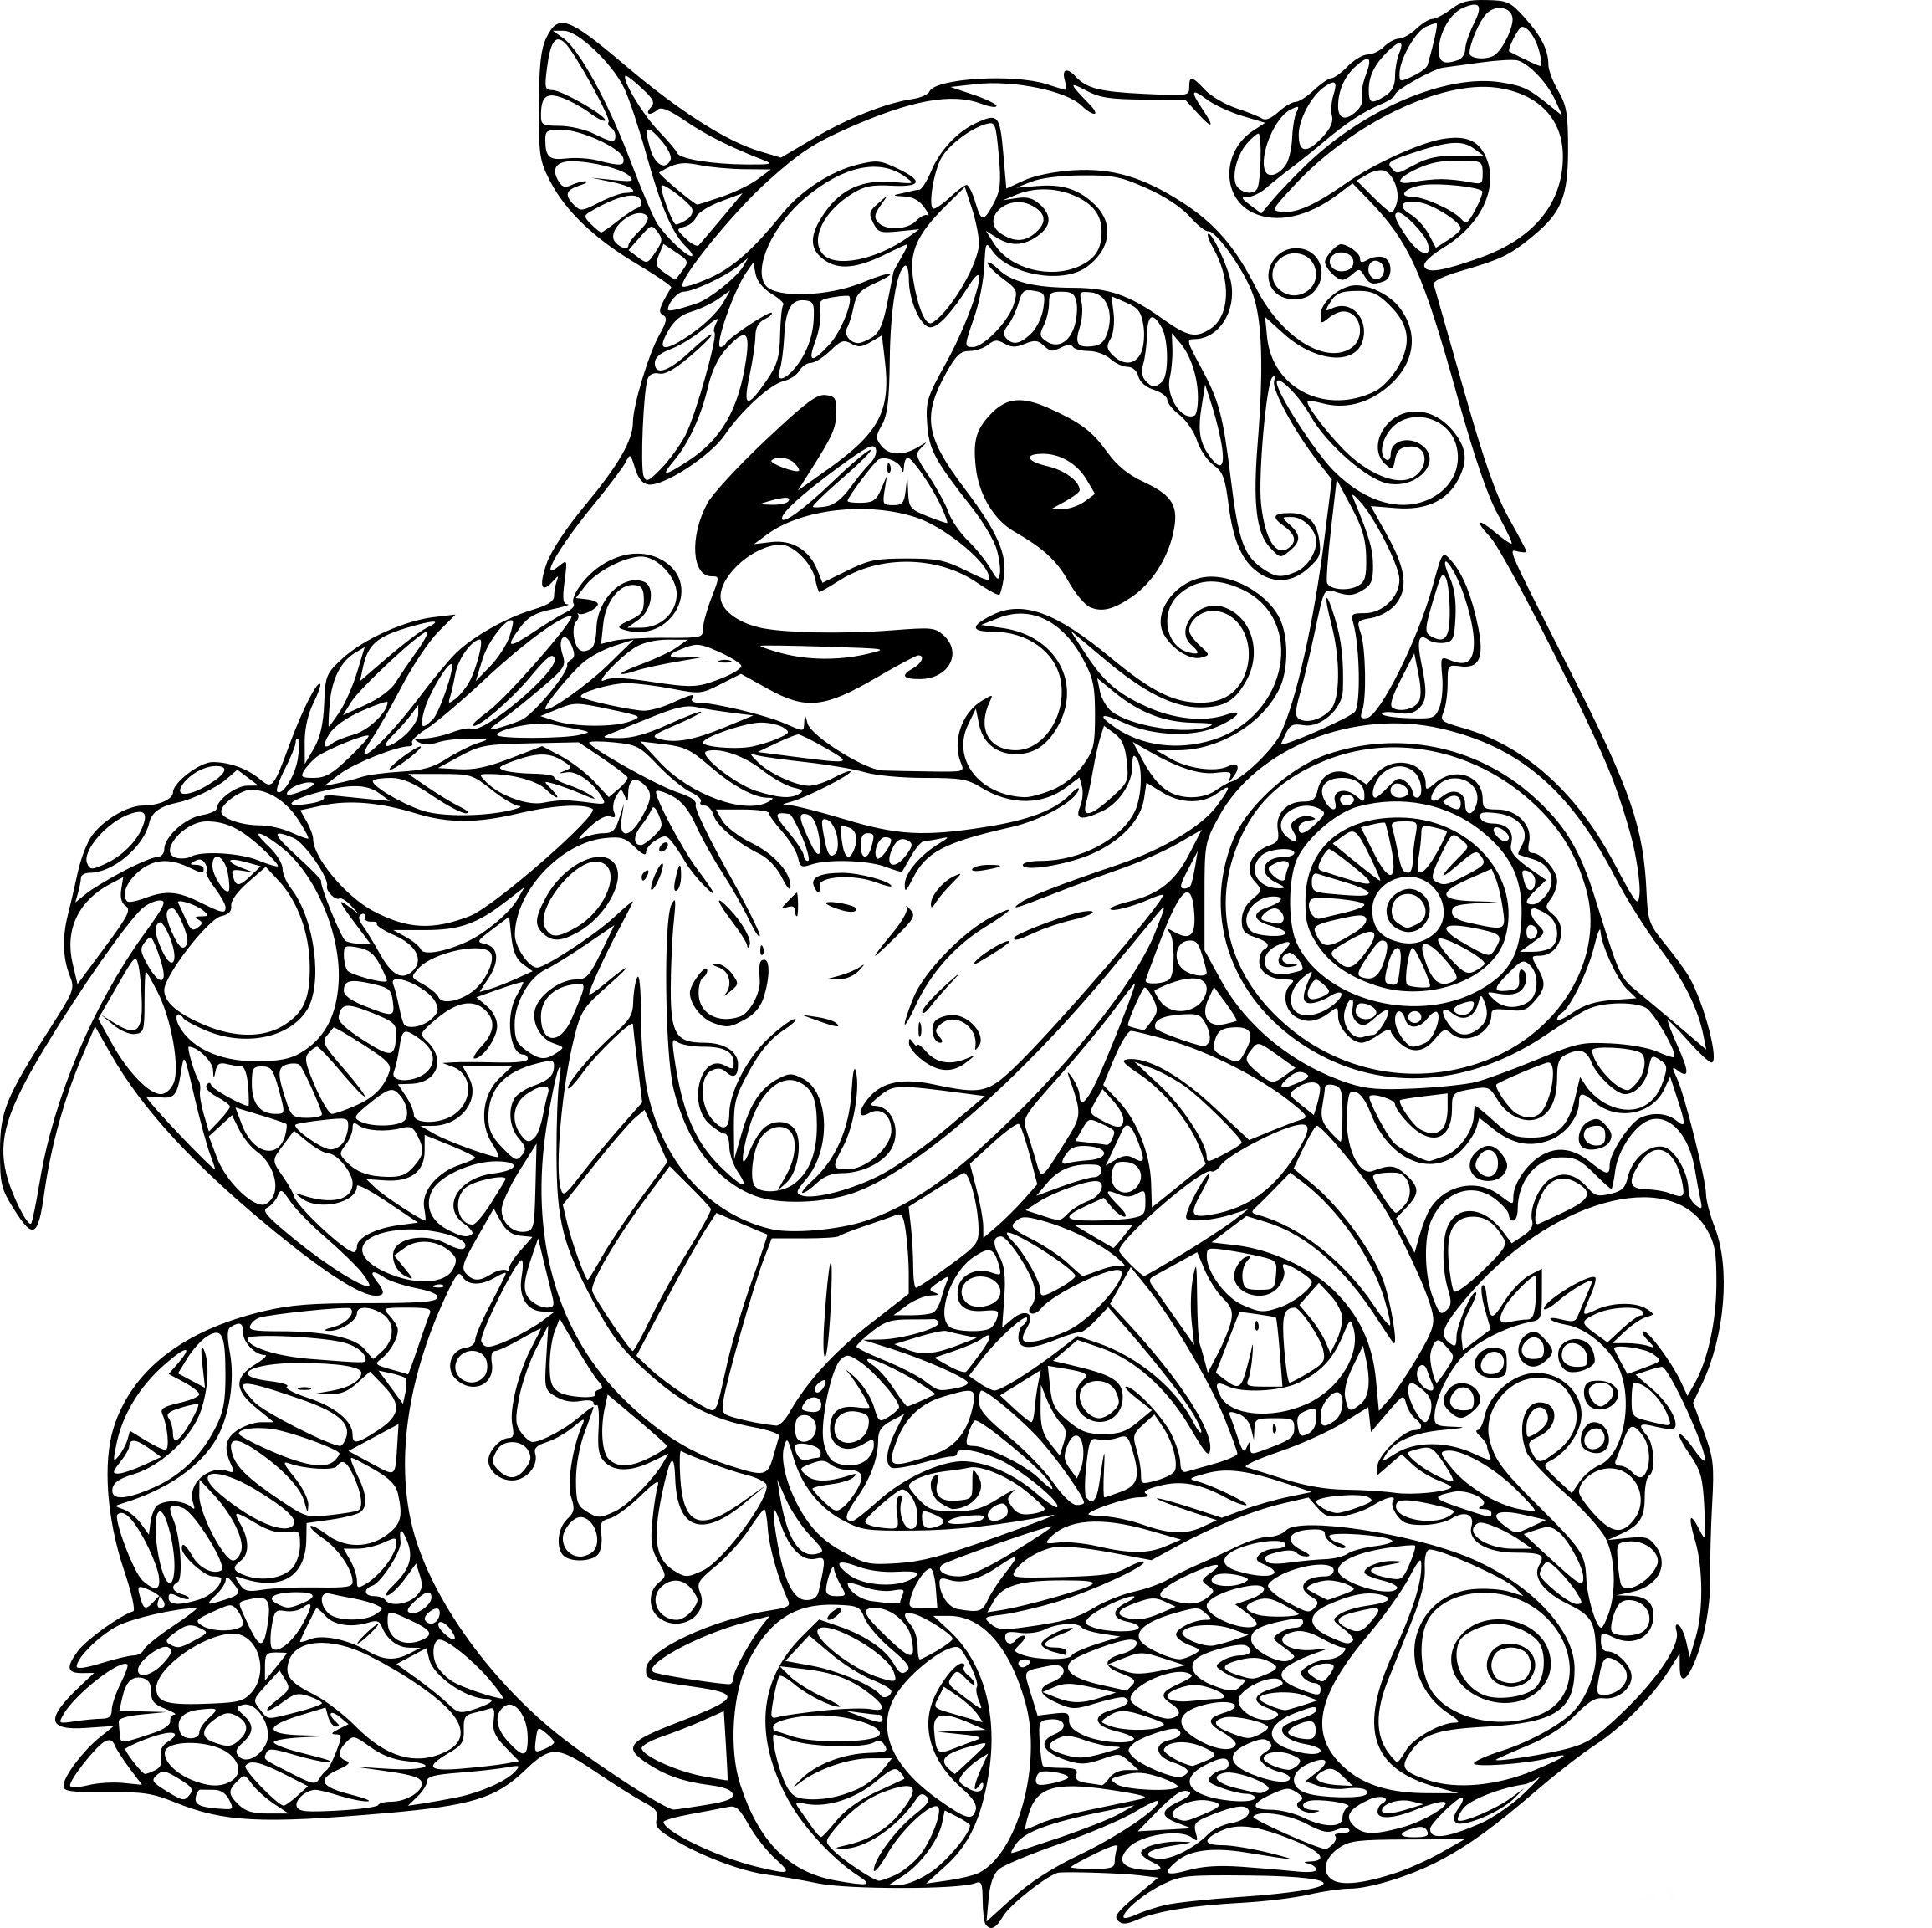 Coloriage Panda Mandala | Coloriage Mandala Animaux concernant Mandala Animaux À Imprimer Gratuit